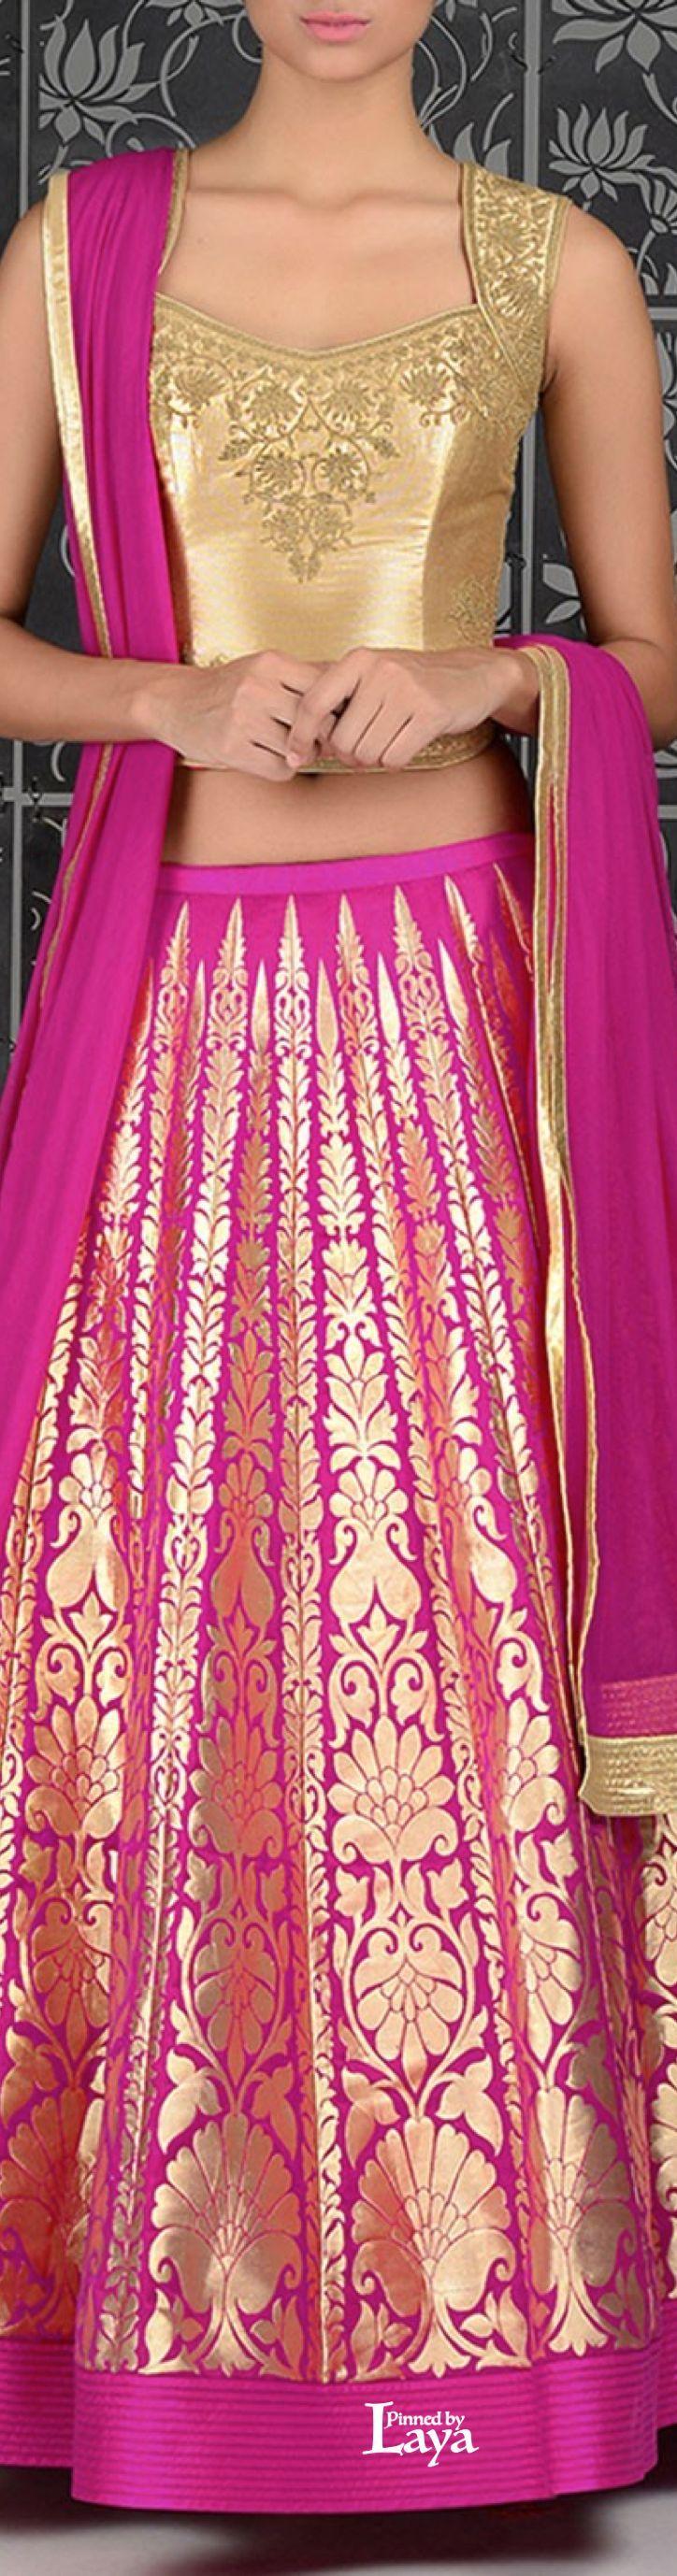 Pin de Shreya en traditional dresse | Pinterest | Ropa